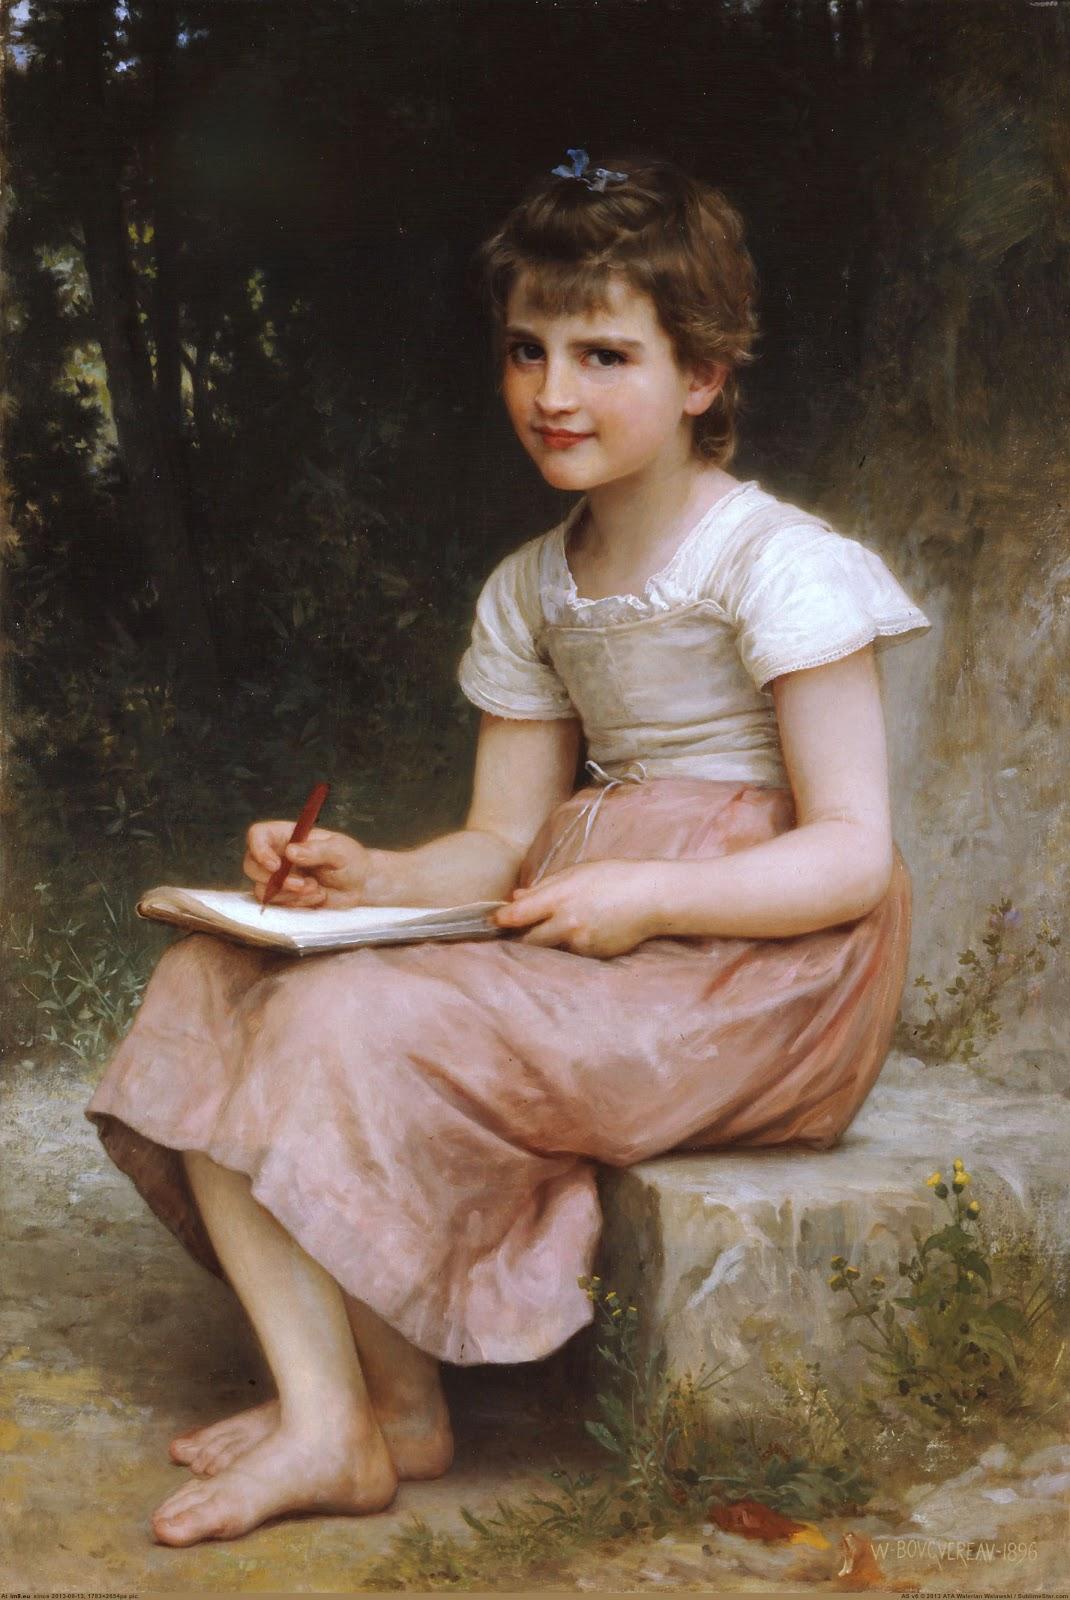 Une vocation. 1896. Óleo sobre tela - 105.5 x 70 cm